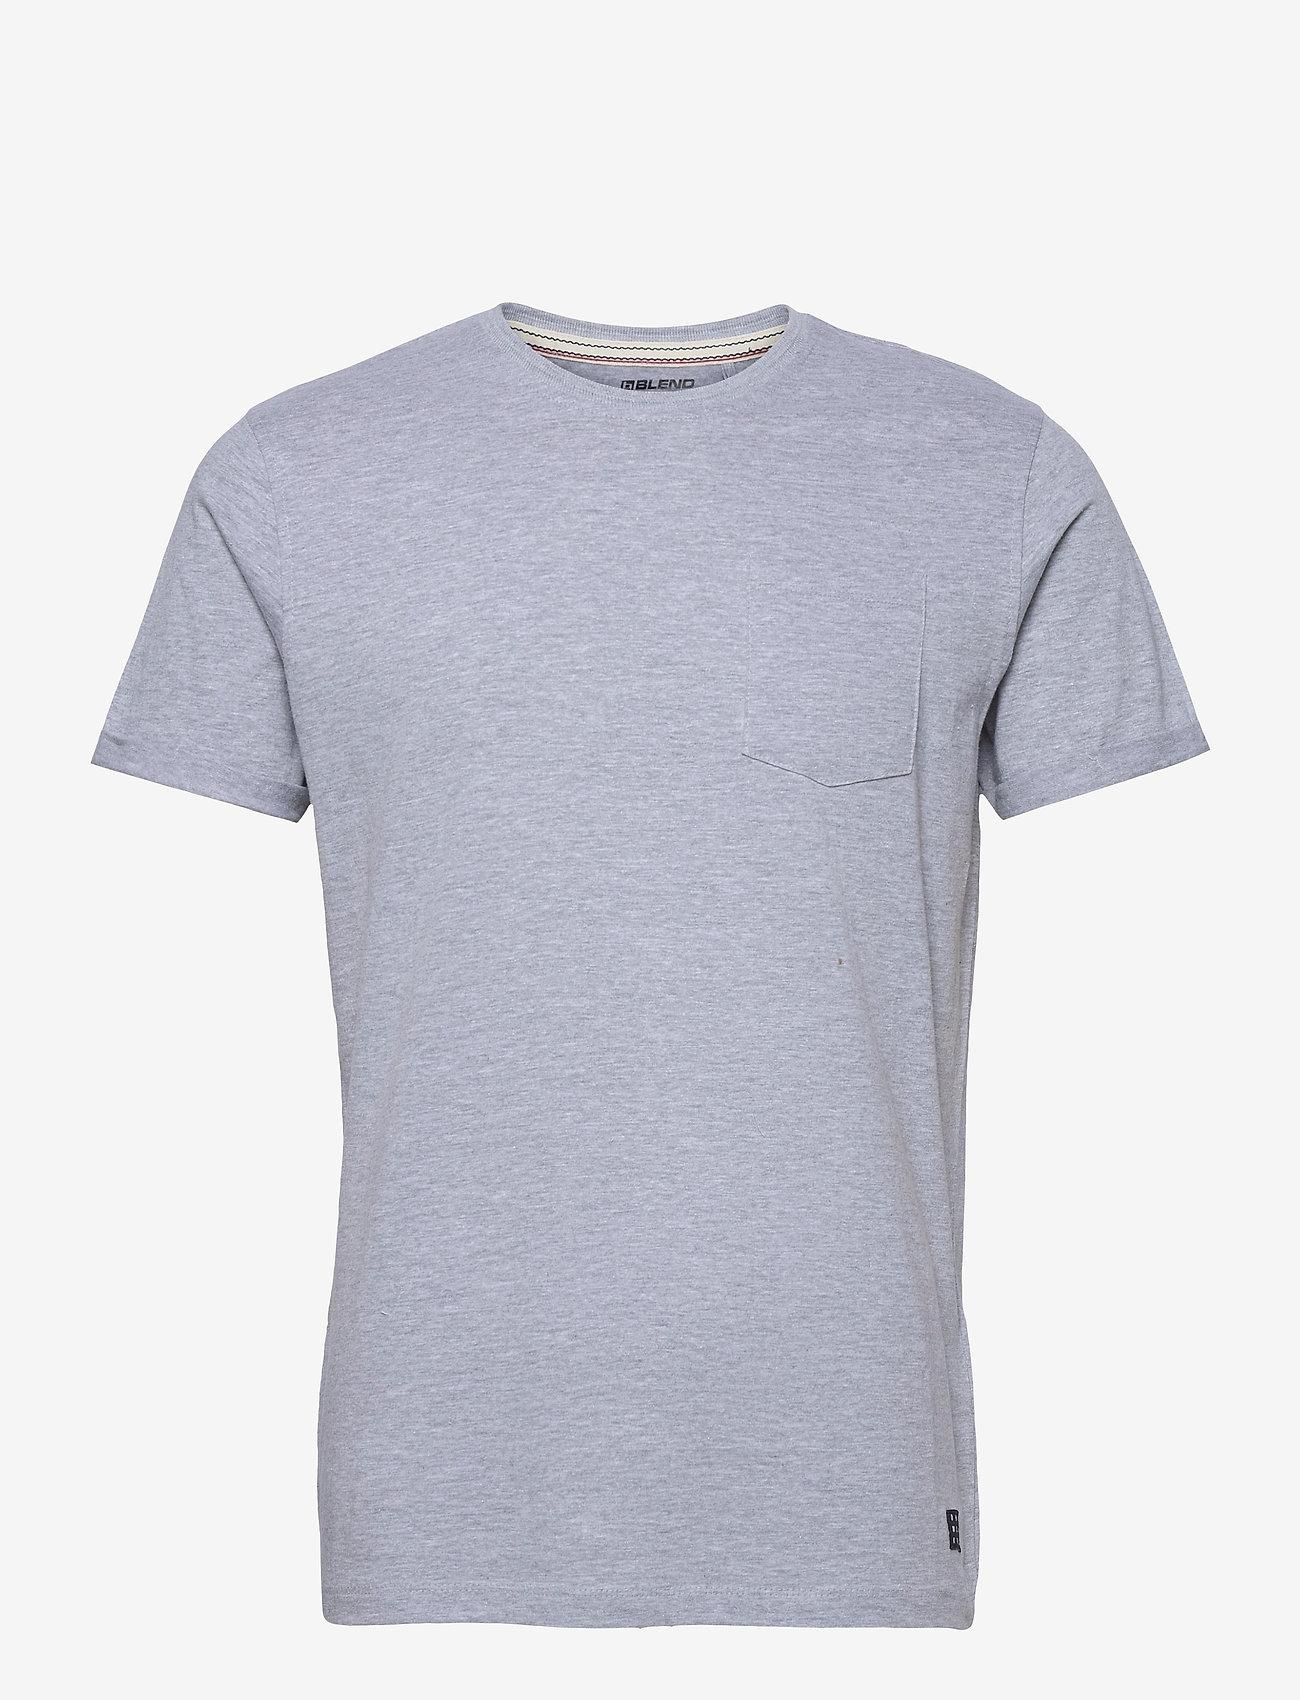 Blend - Tee - Organic - basic t-shirts - stone mix - 0